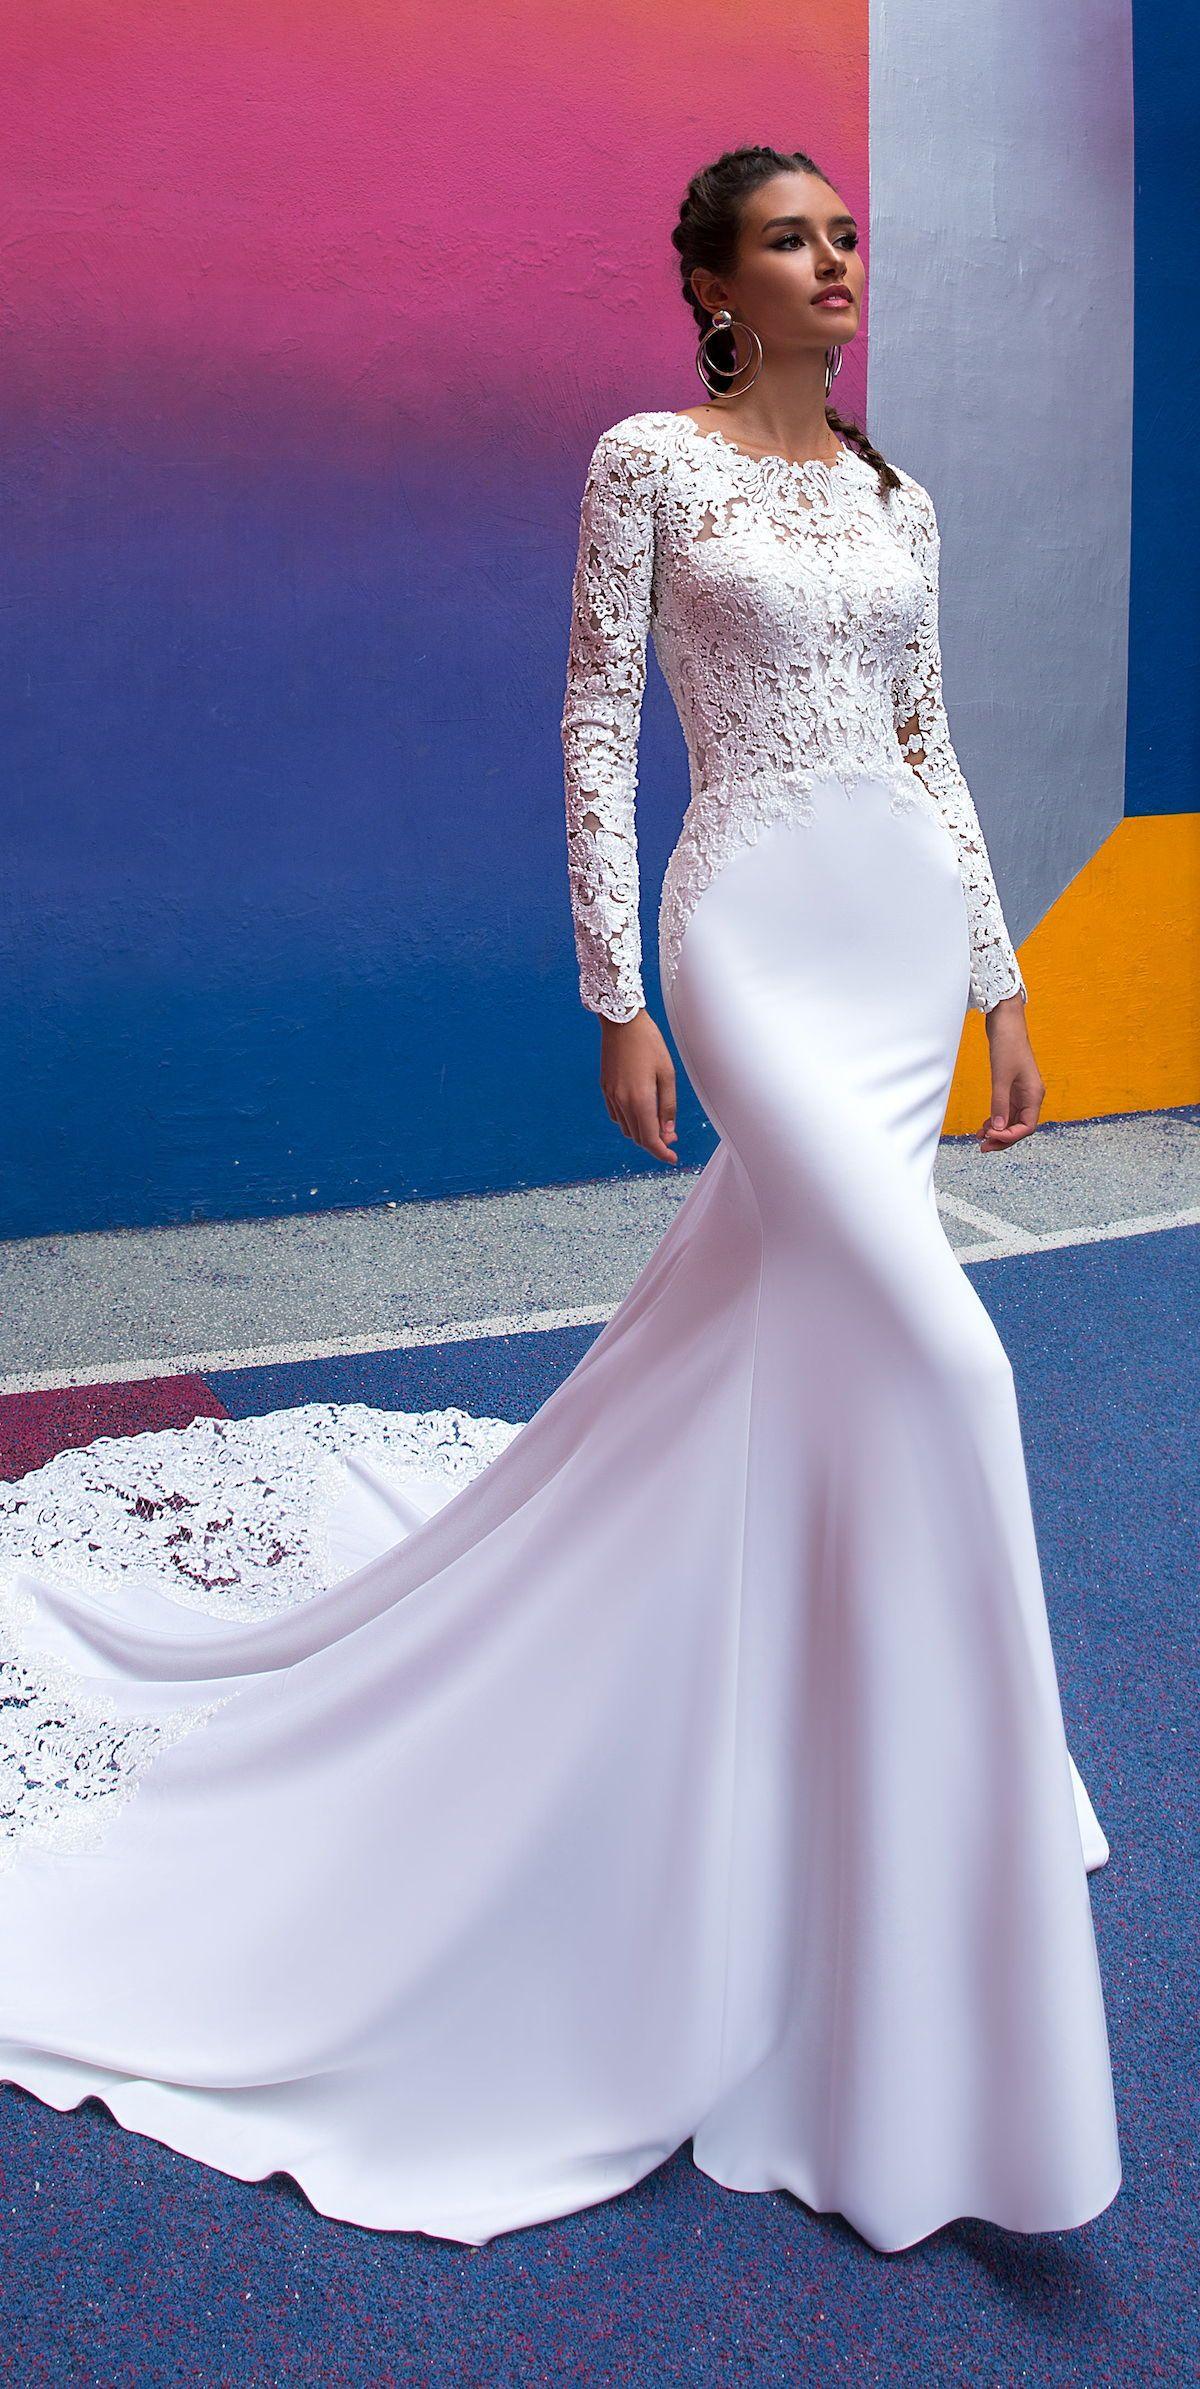 Crystal Designs Wedding Dress Paris Collection Long Sleeve Simple Mermaid Wedding Long Sleeve Wedding Dress Lace Wedding Dress Long Sleeve Wedding Dresses [ 2389 x 1200 Pixel ]